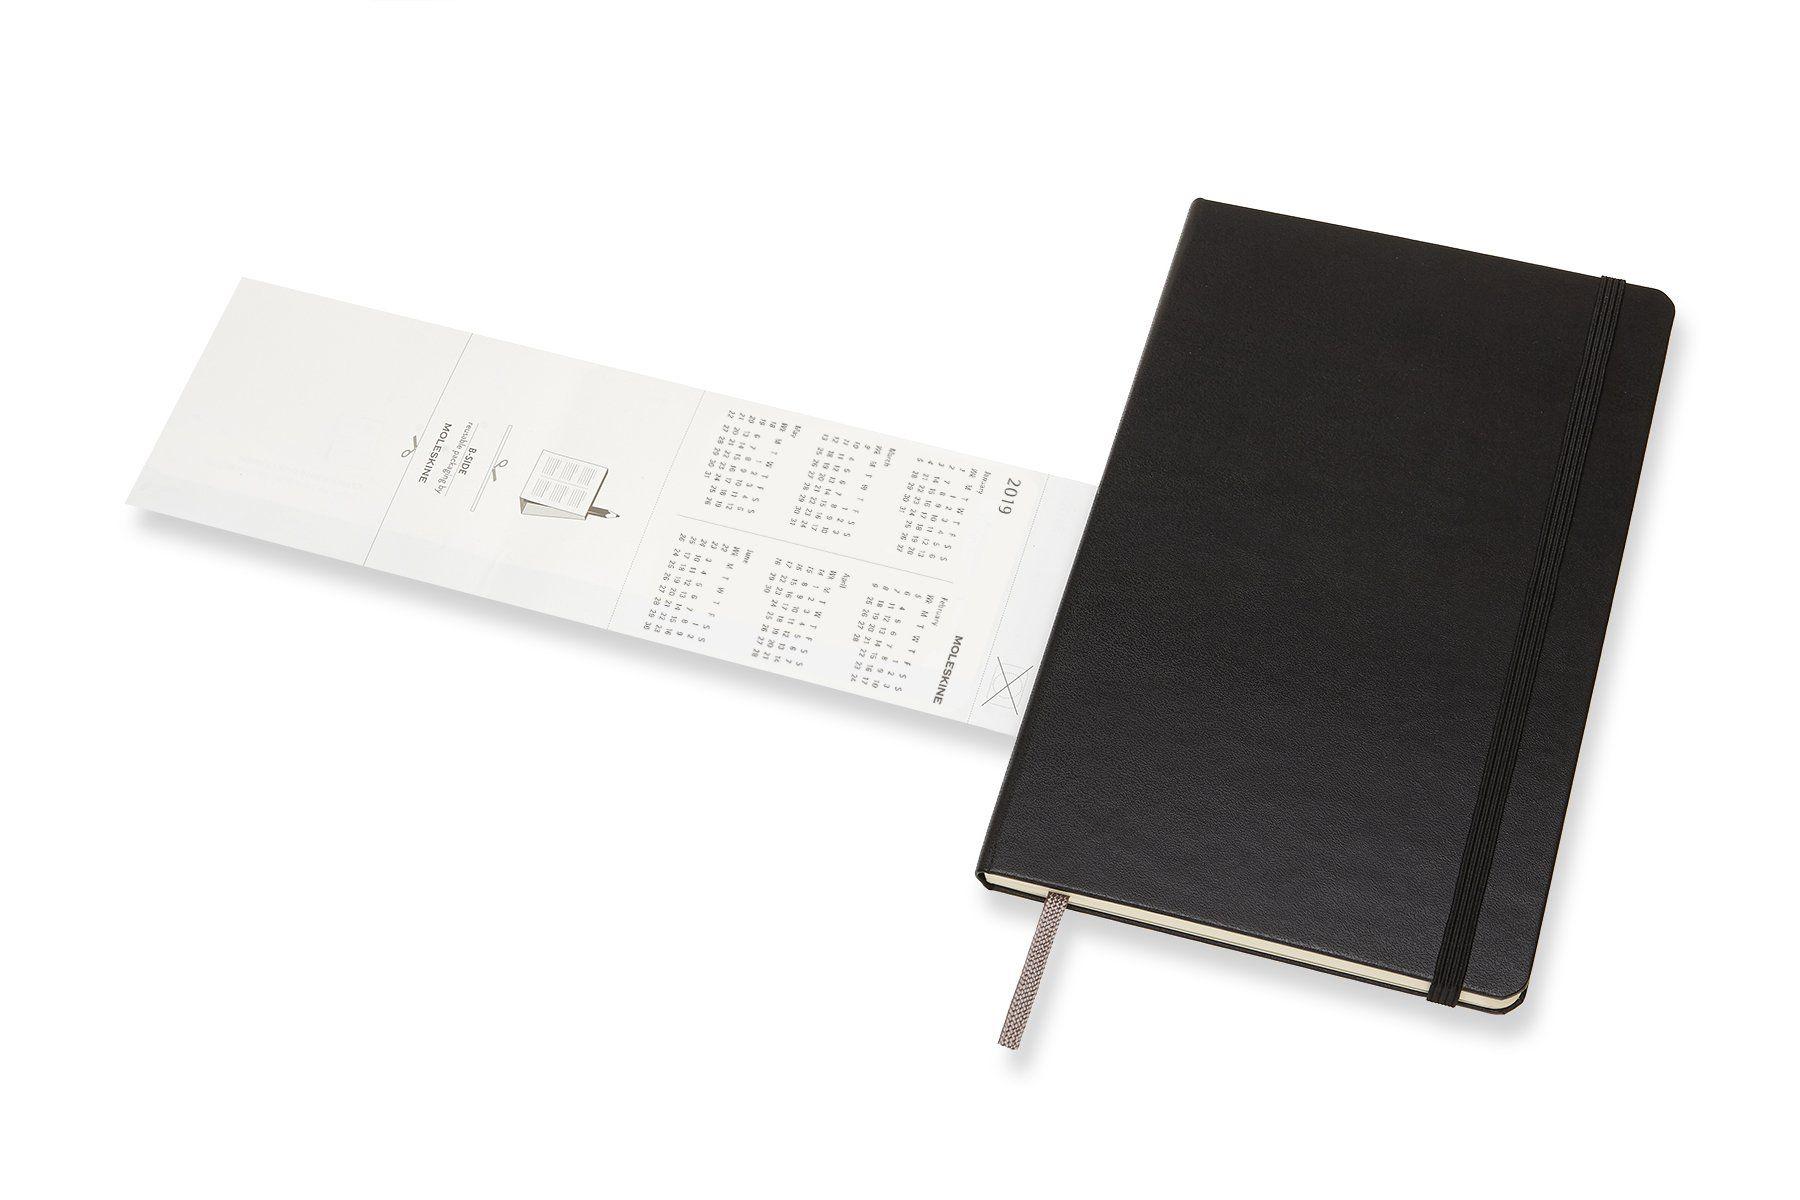 Vertikal 12 Monate Taschenkalender A5 Moleskine Wochenkalender Hard Cover Large Schwarz 2020